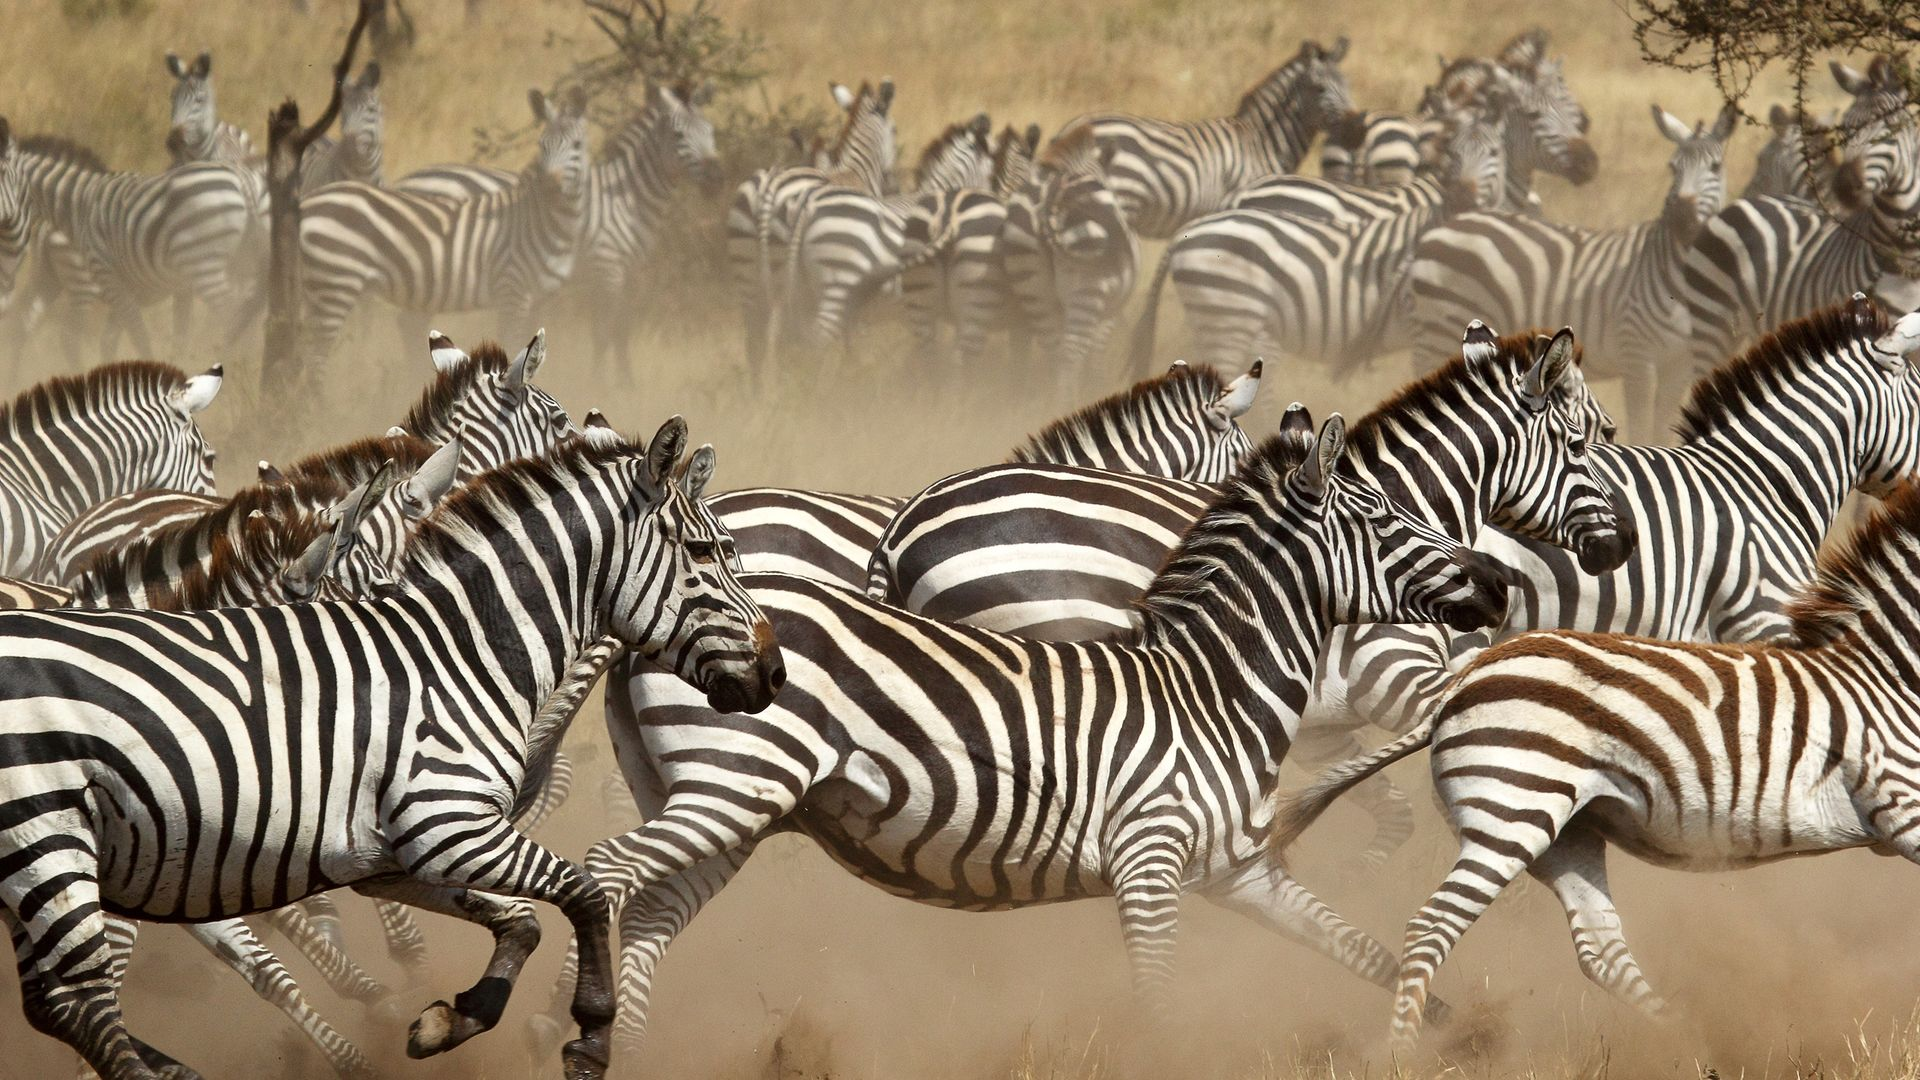 670c6bbe989823 Prive safari reis Noord-Tanzania   Zanzibar - 15 dagen